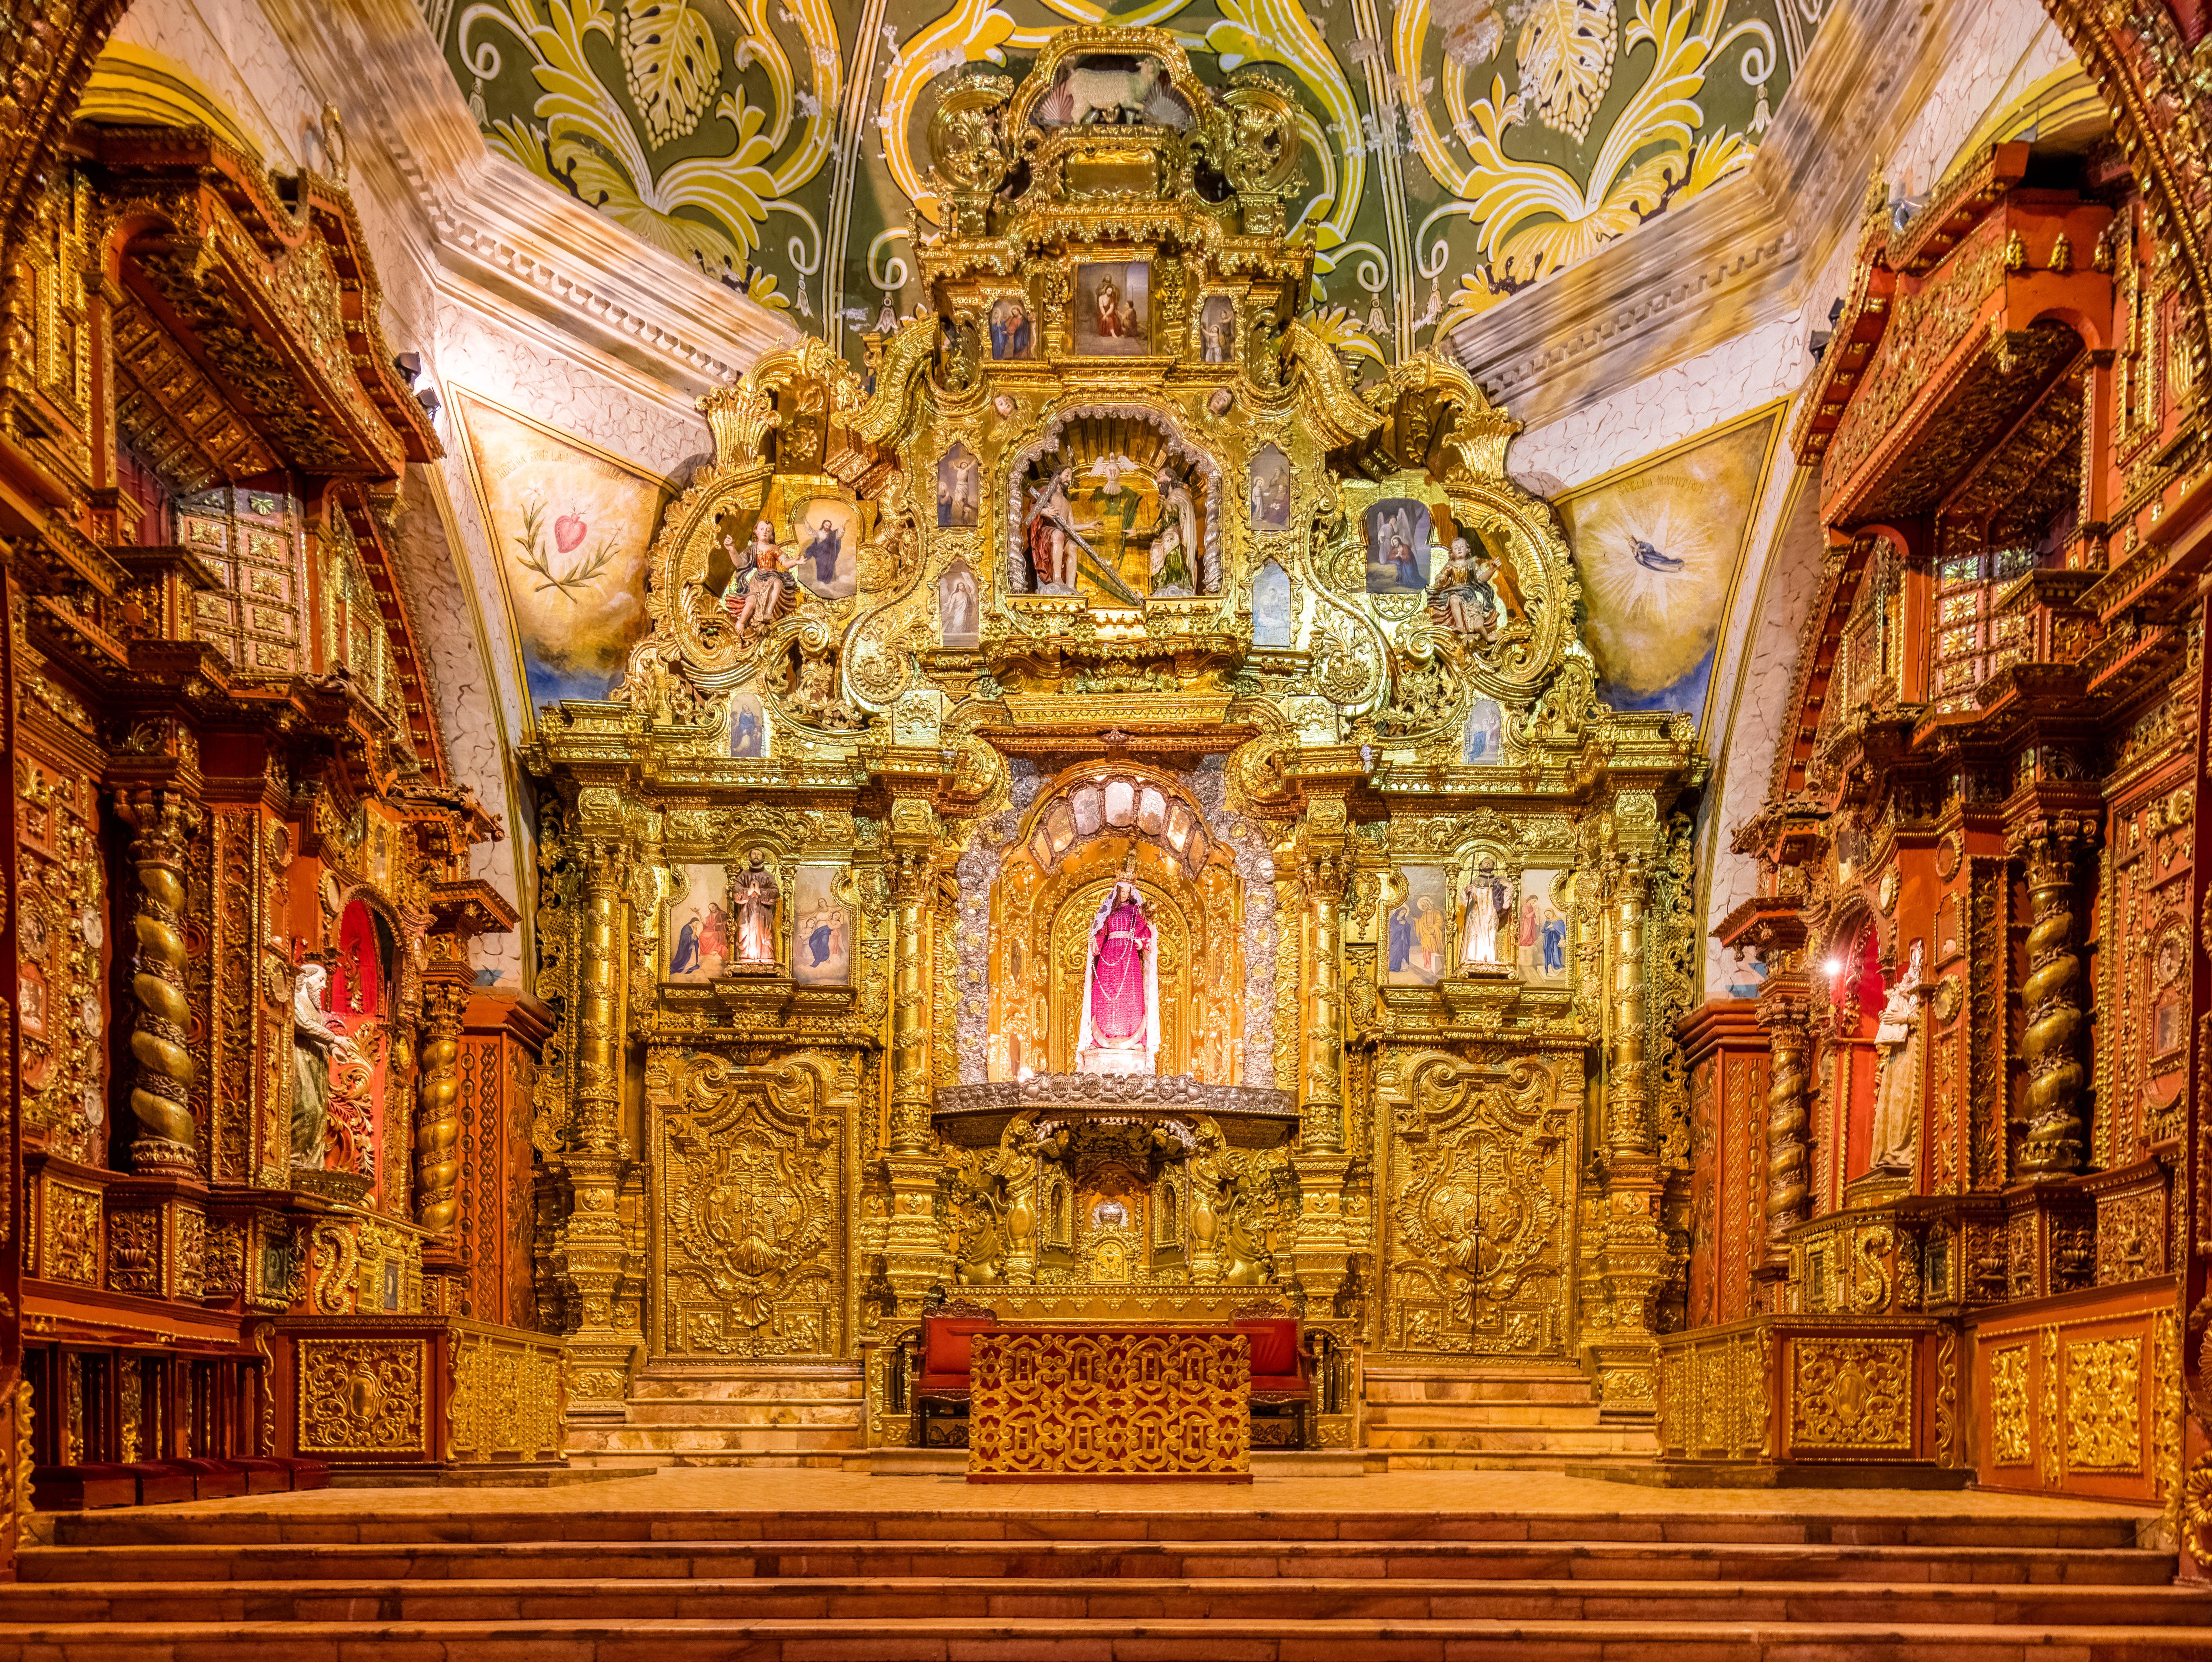 Iglesia_de_Santo_Domingo,_Quito,_Ecuador,_2015-07-22,_DD_199-201_HDR.JPG